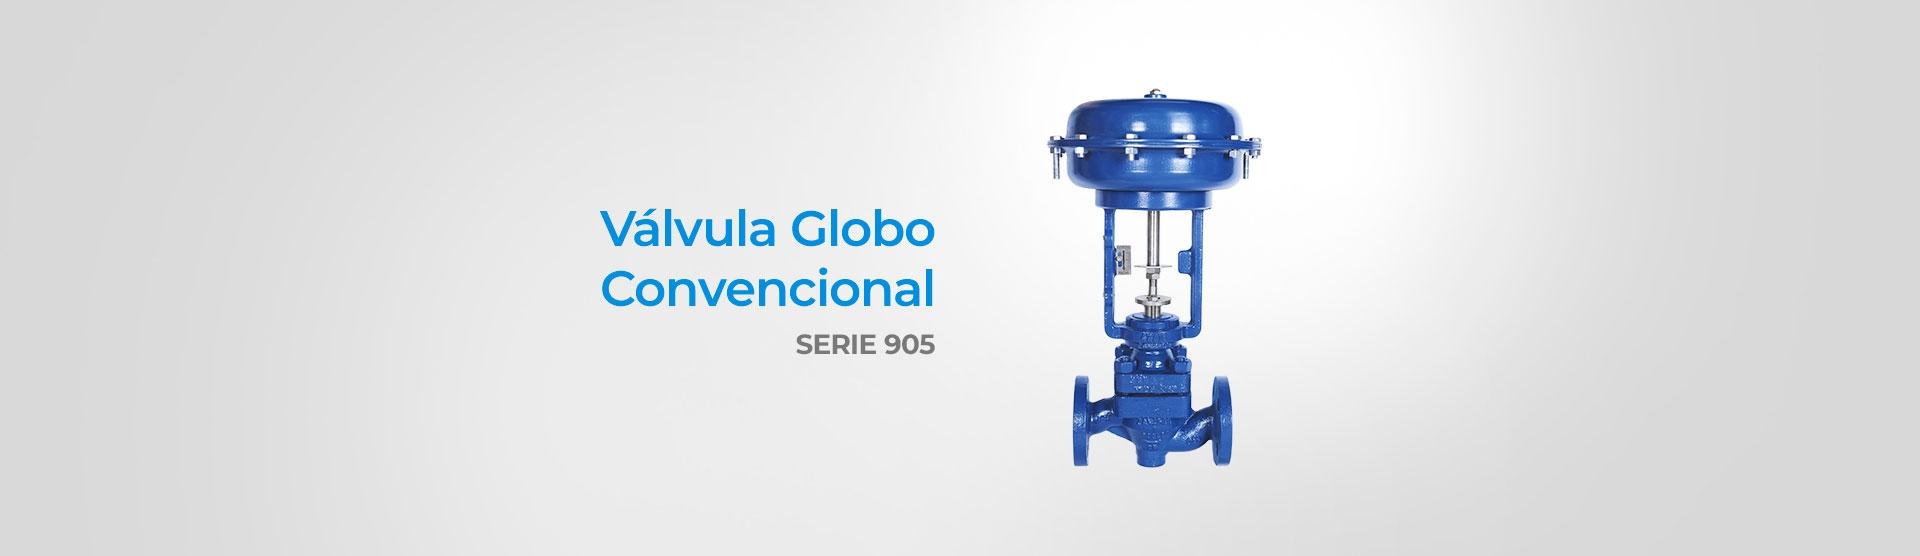 Válvula Globo Convencional (Serie 905)